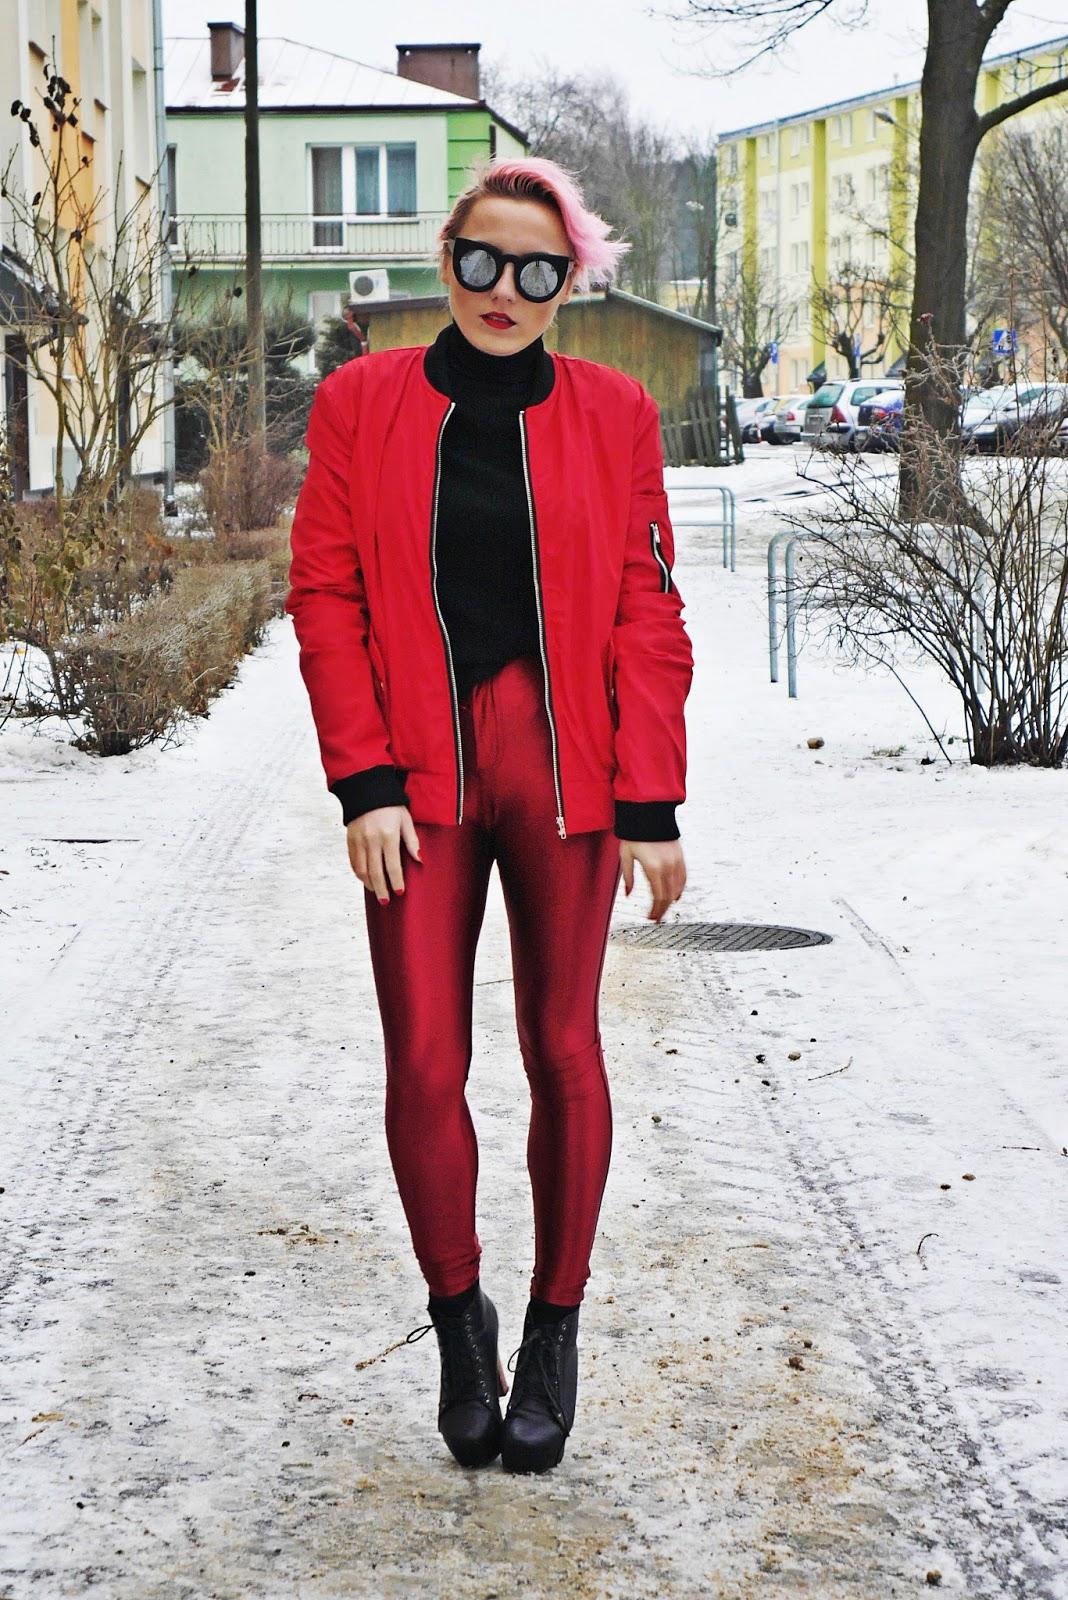 blogerka_modowa_karyn_blog_modowy_pulawy_look_190217c